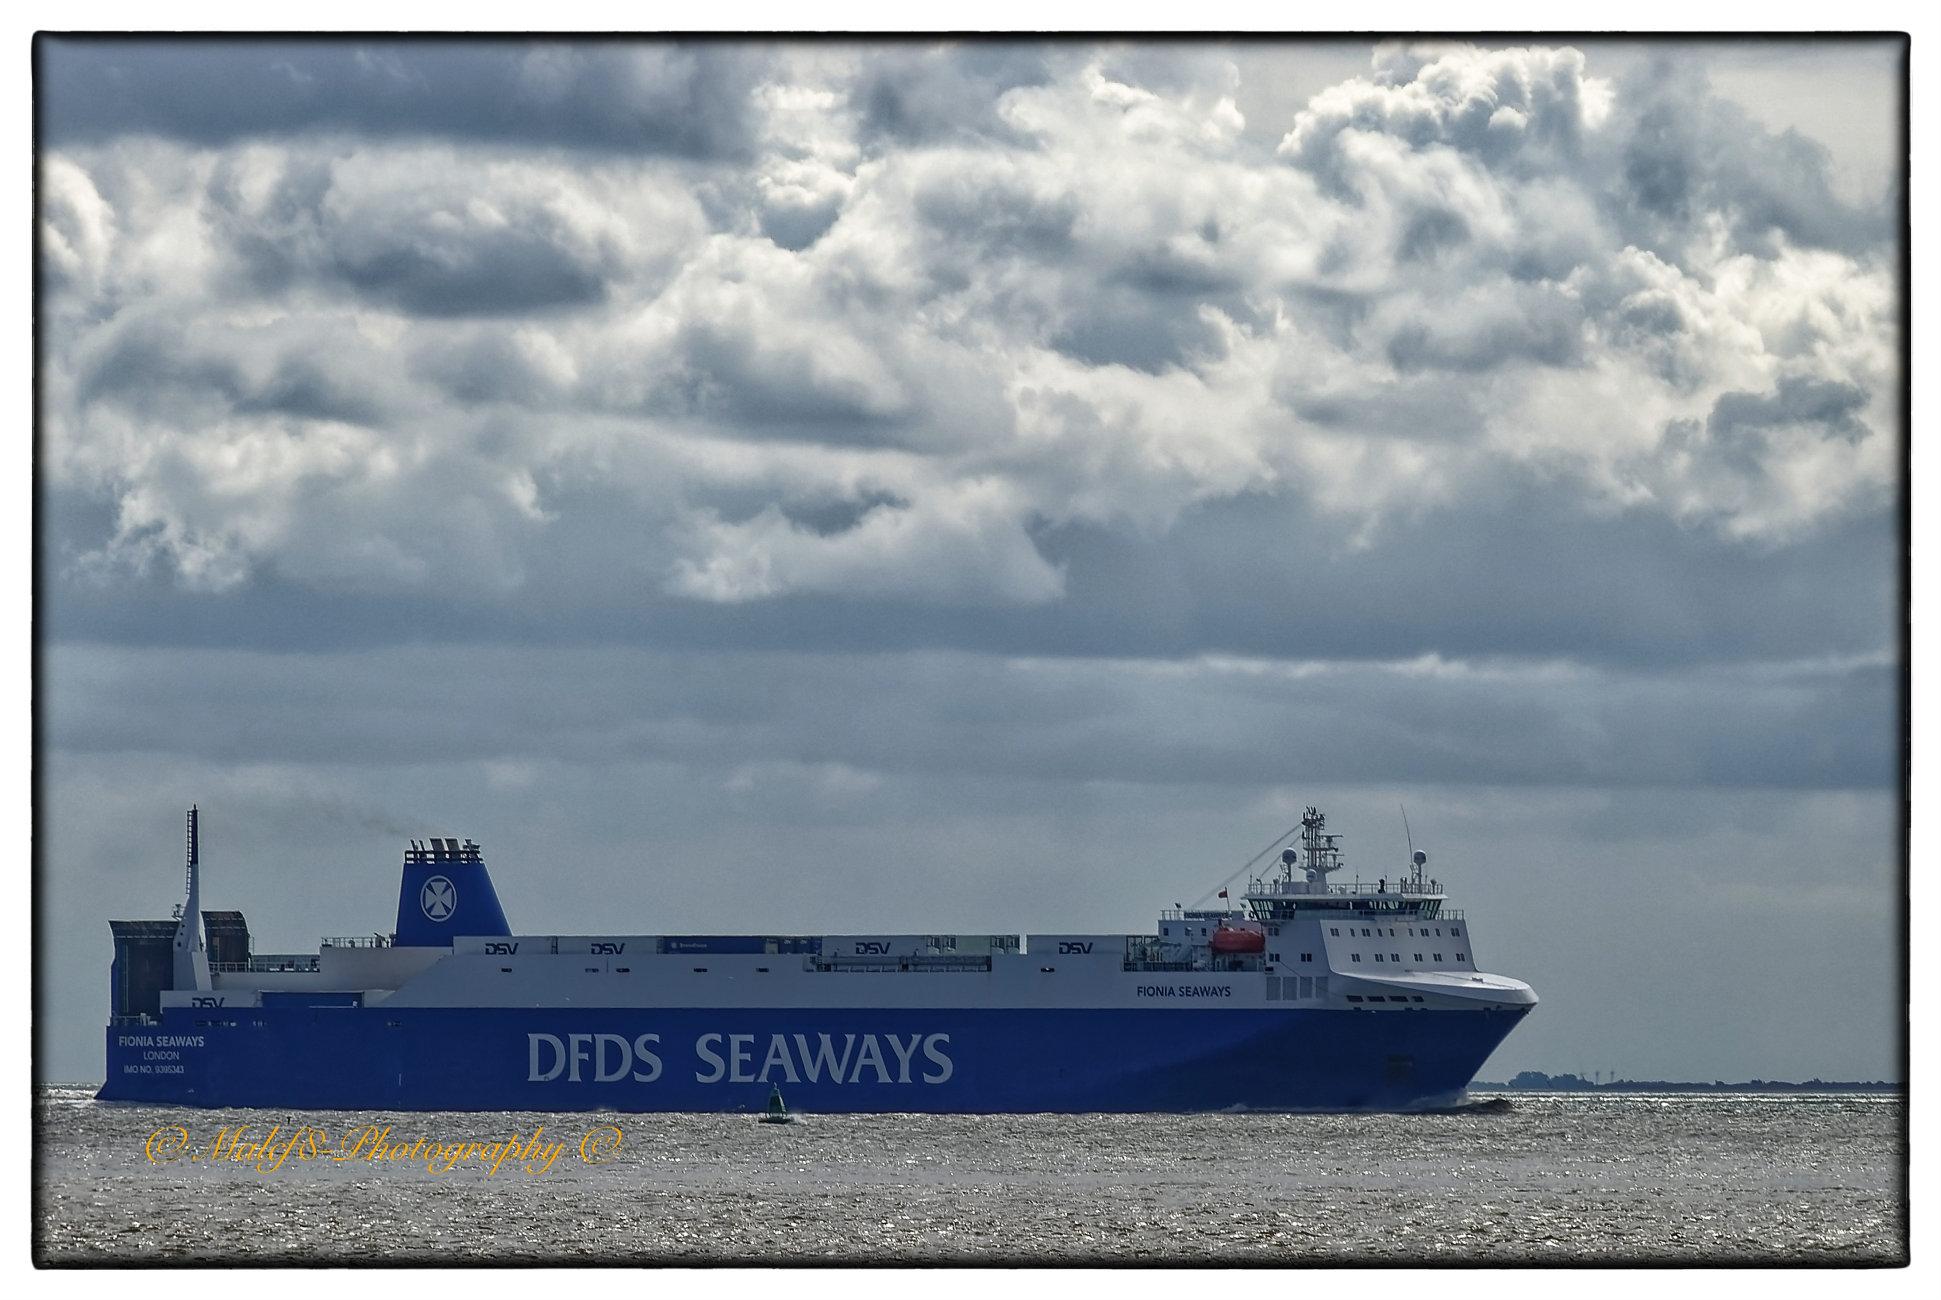 Views at Spurn, Humber Estuary Shipping